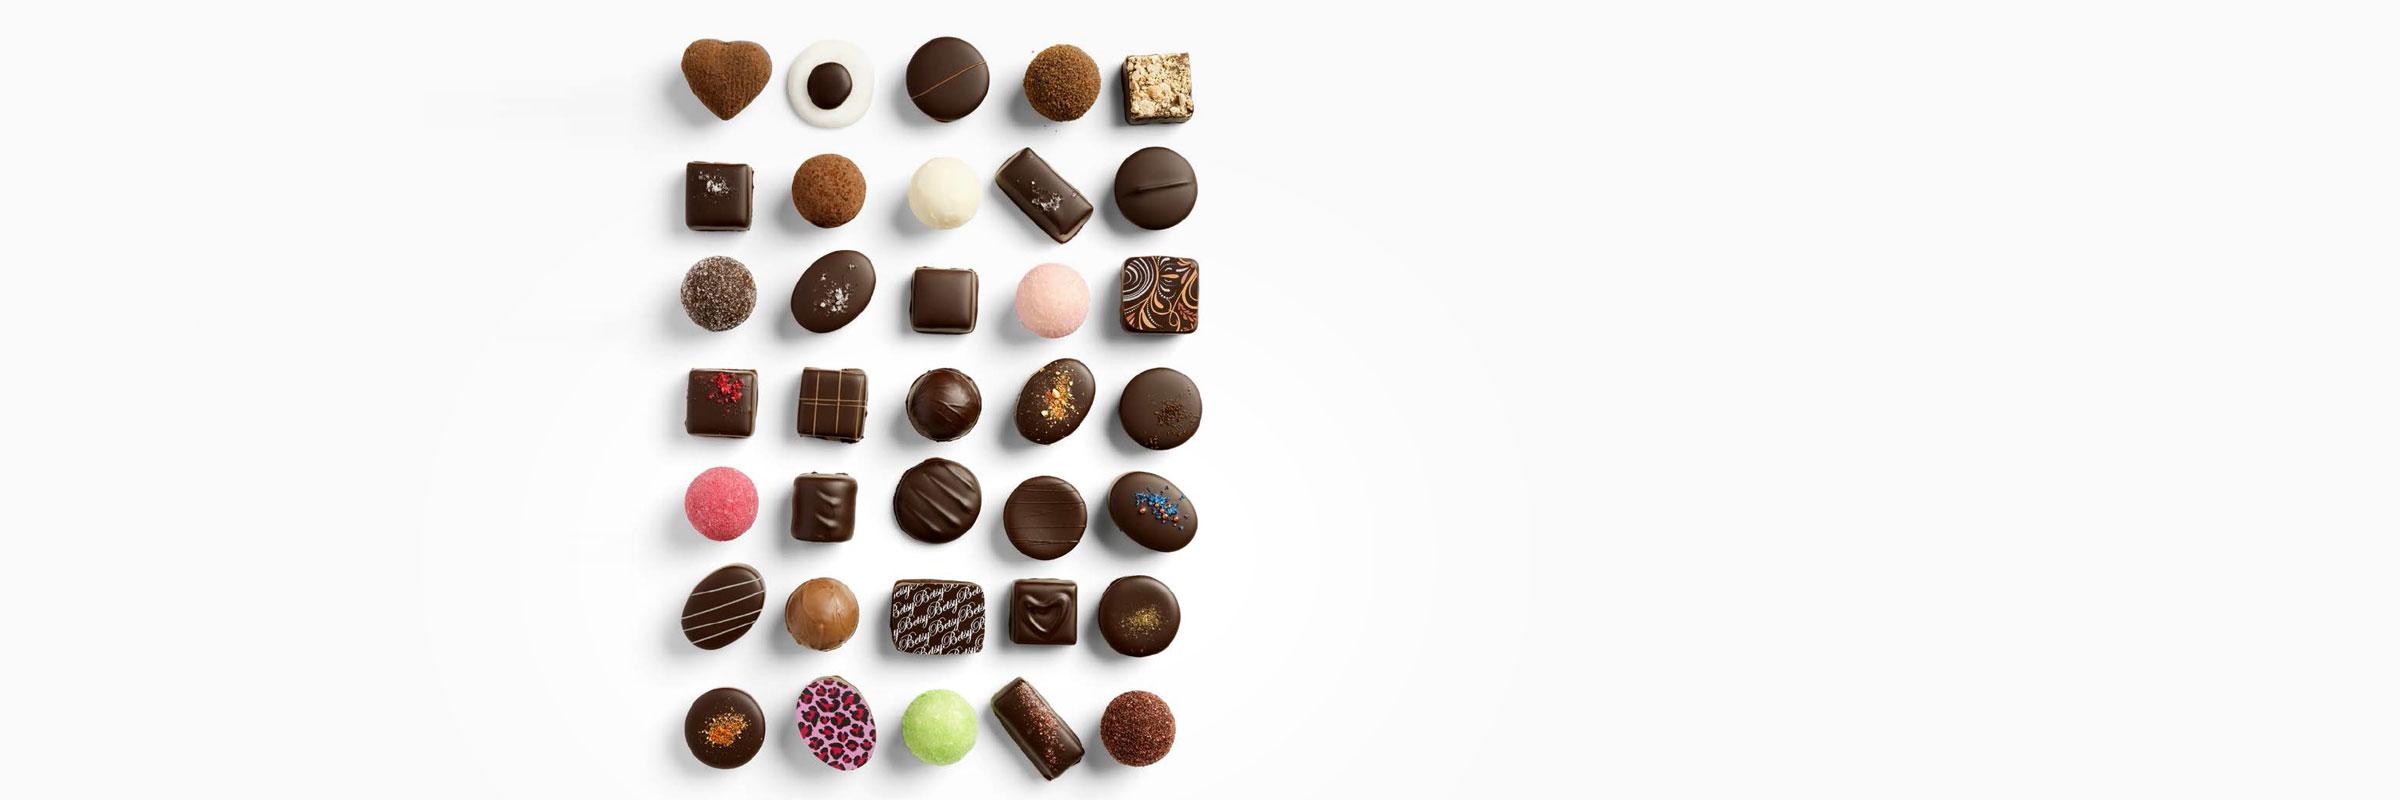 betsy-sandberg-choklad-midsommar-grey